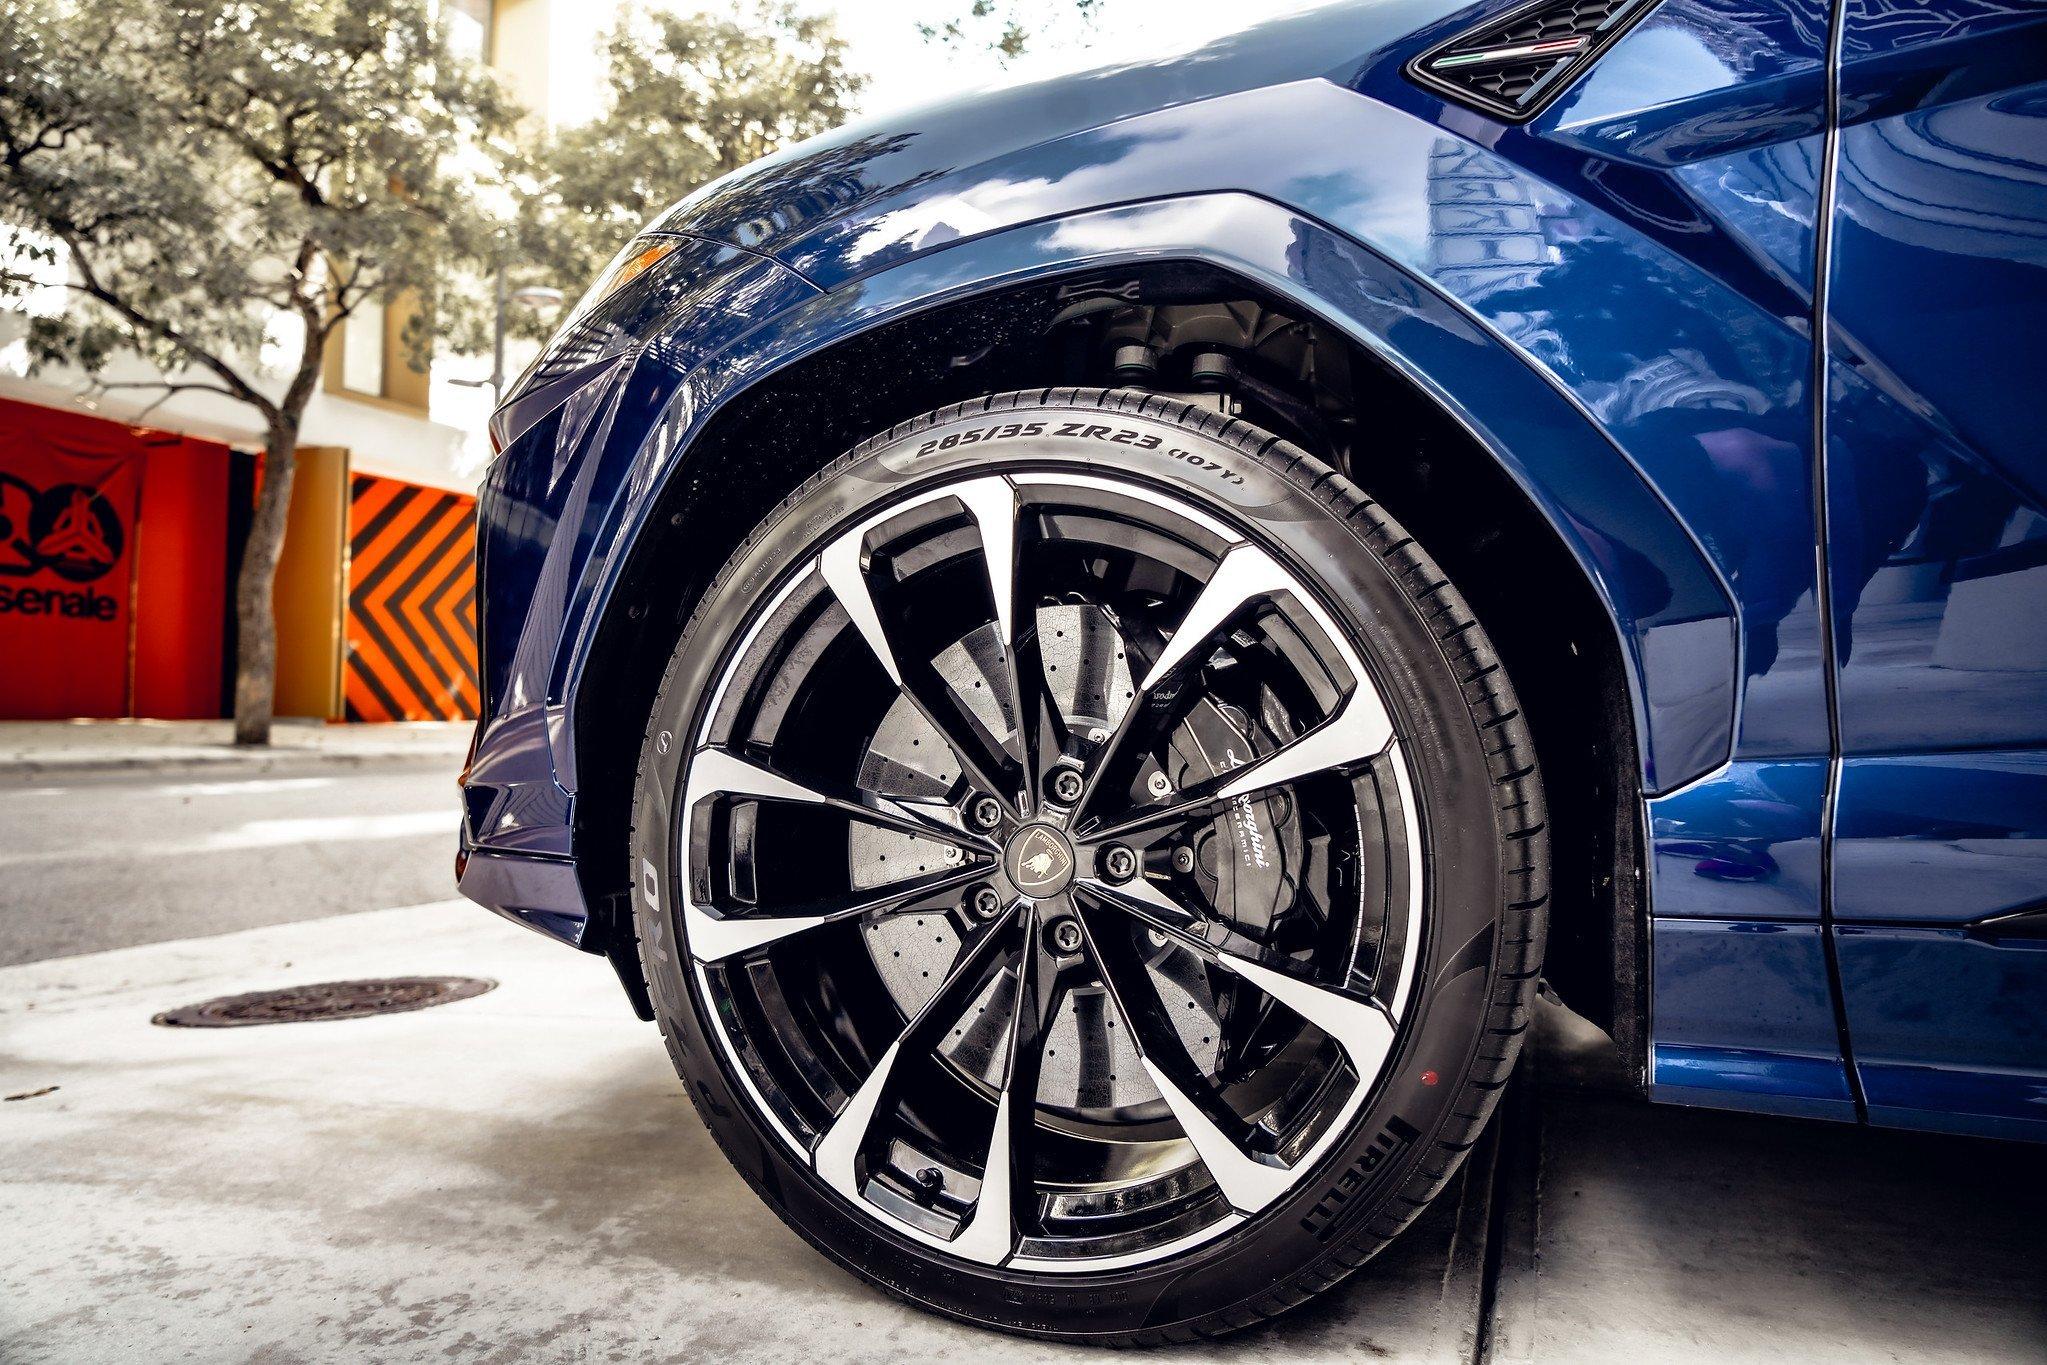 Image #1 of our  2021 Lamborghini Urus - Dark Blue    In Miami Fort Lauderdale Palm Beach South Florida